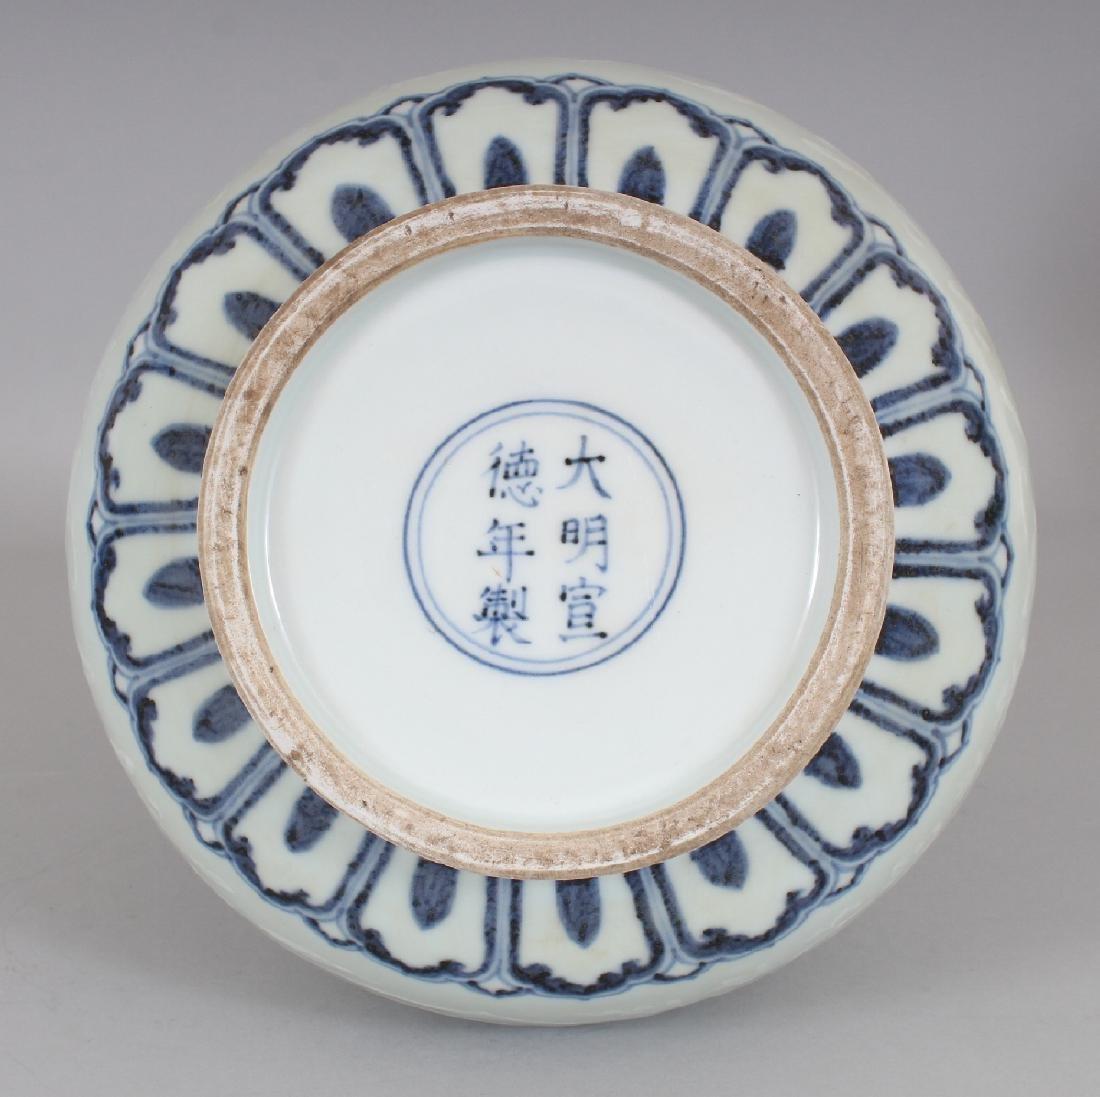 A CHINESE MING STYLE UNDERGLAZE-BLUE & WHITE SLIP - 5